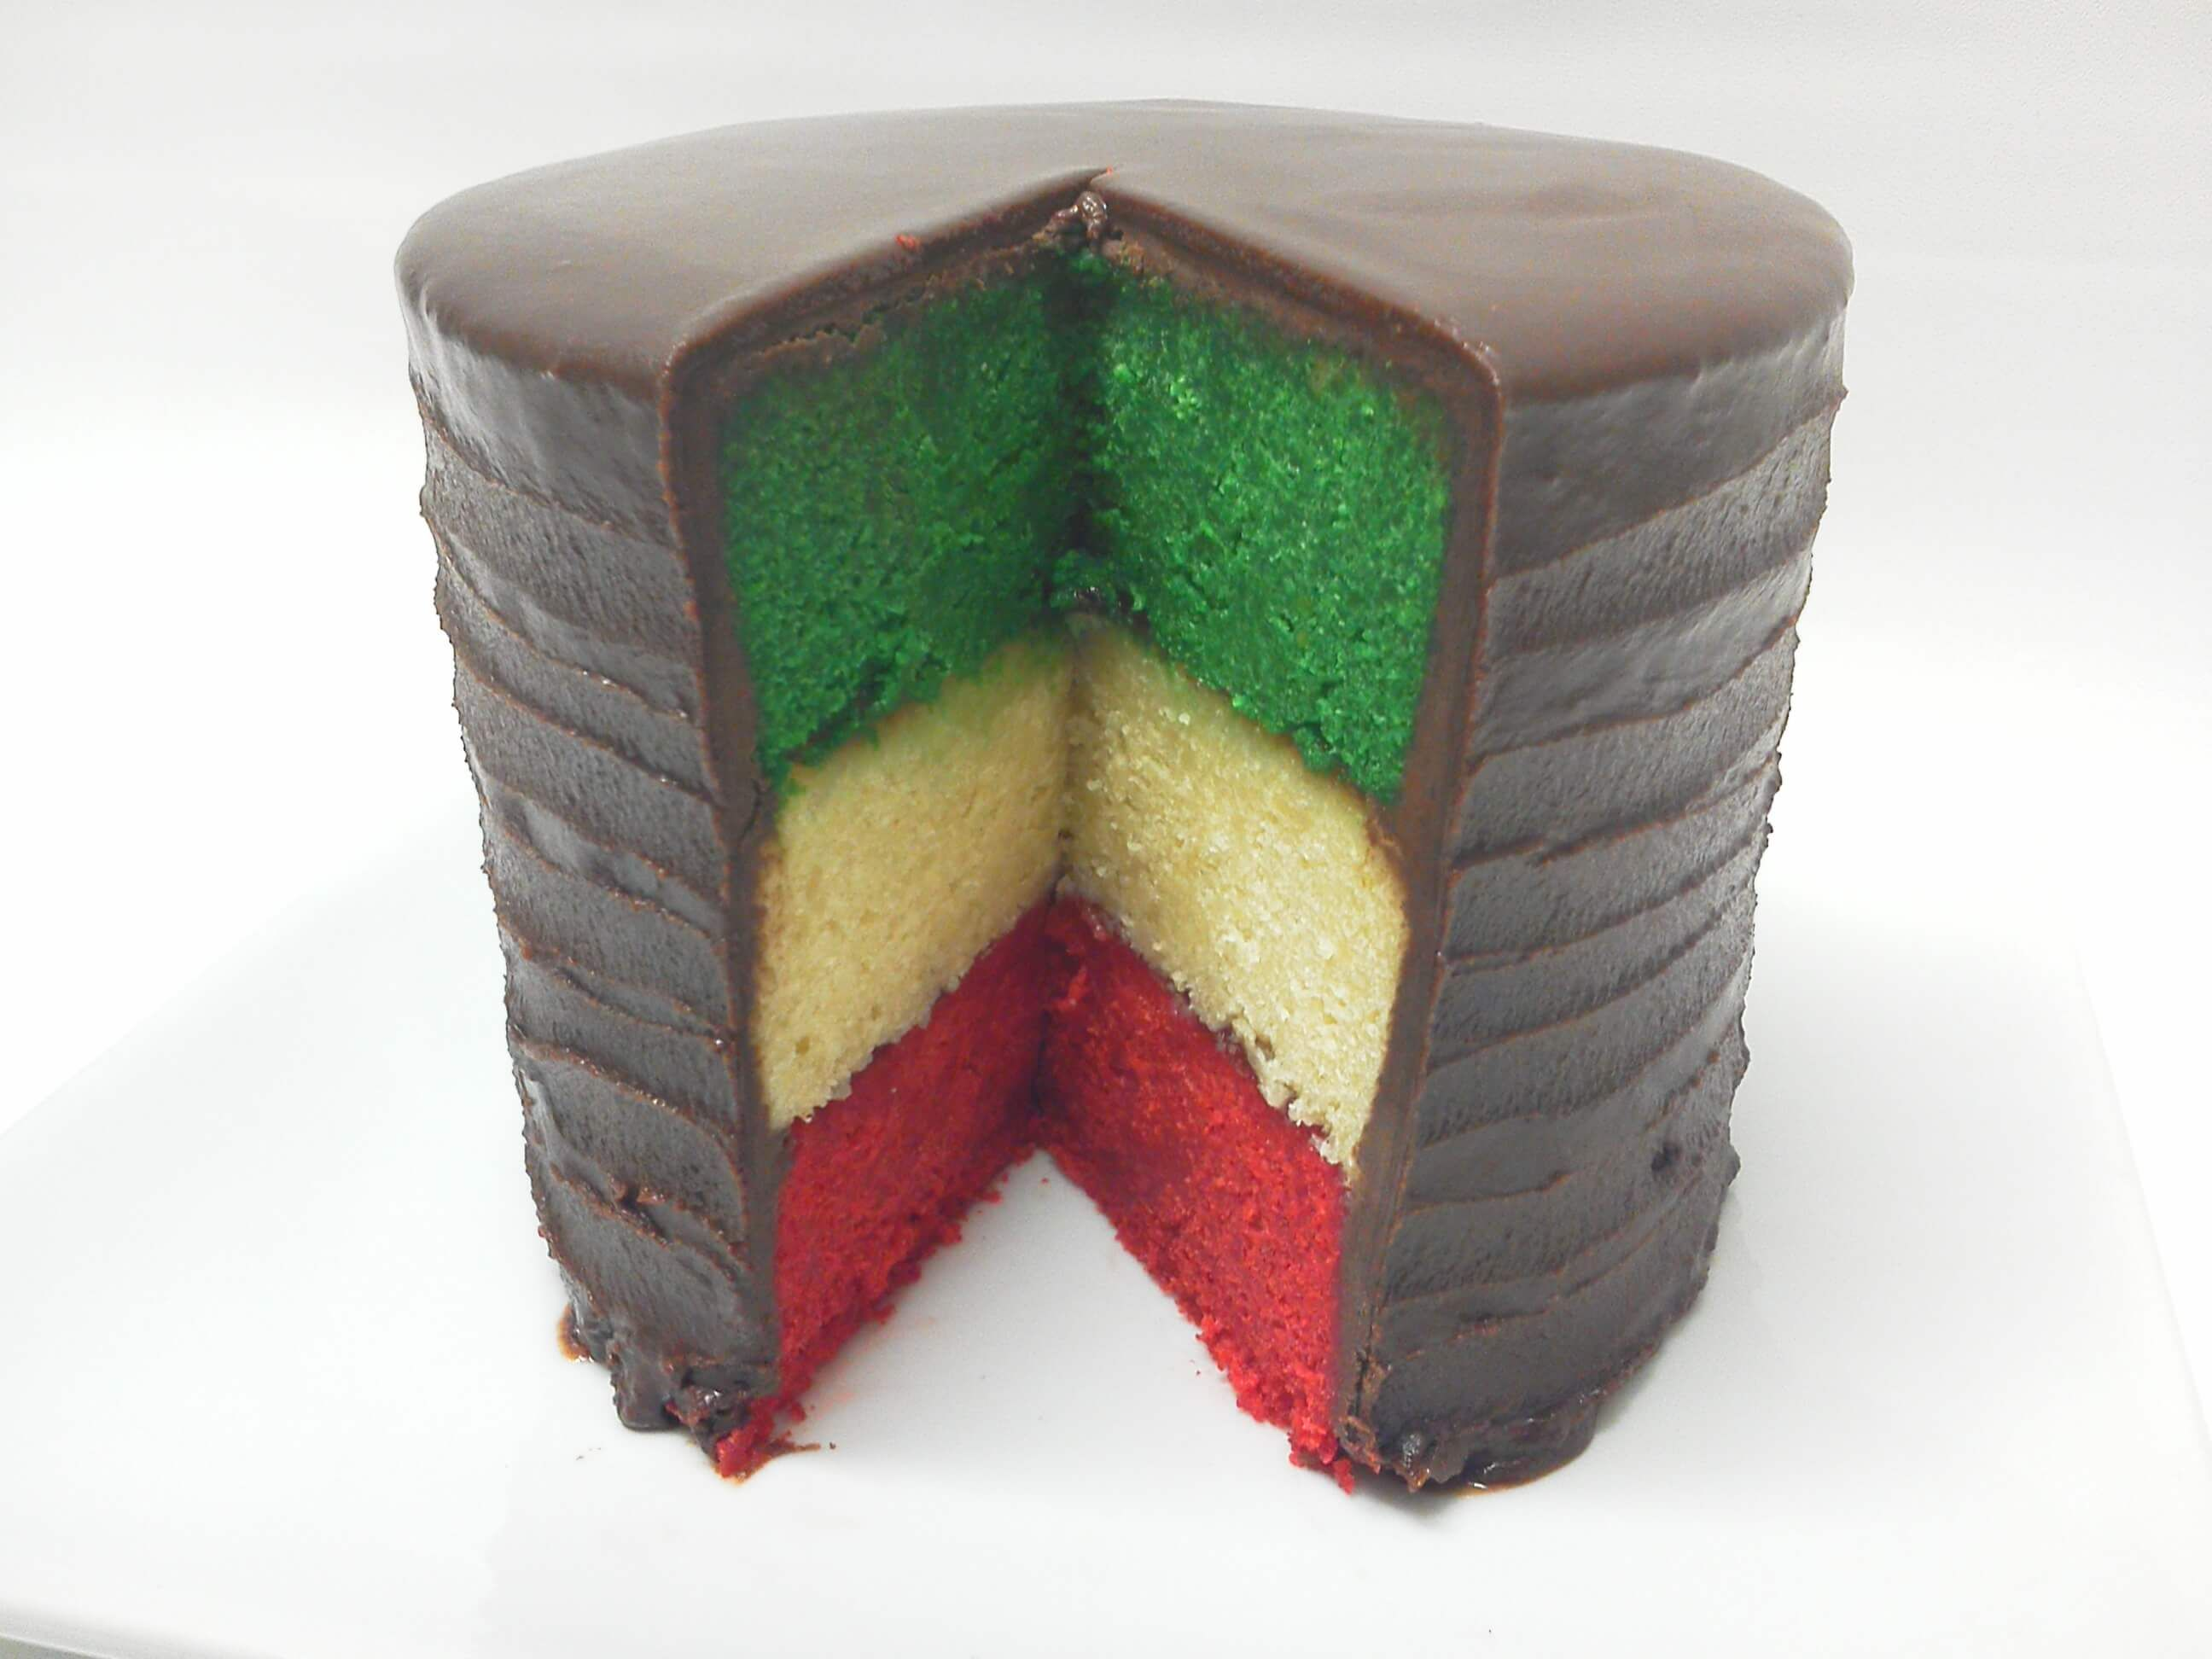 ITALIAN RAINBOW COOKIE CAKE DELIVERED